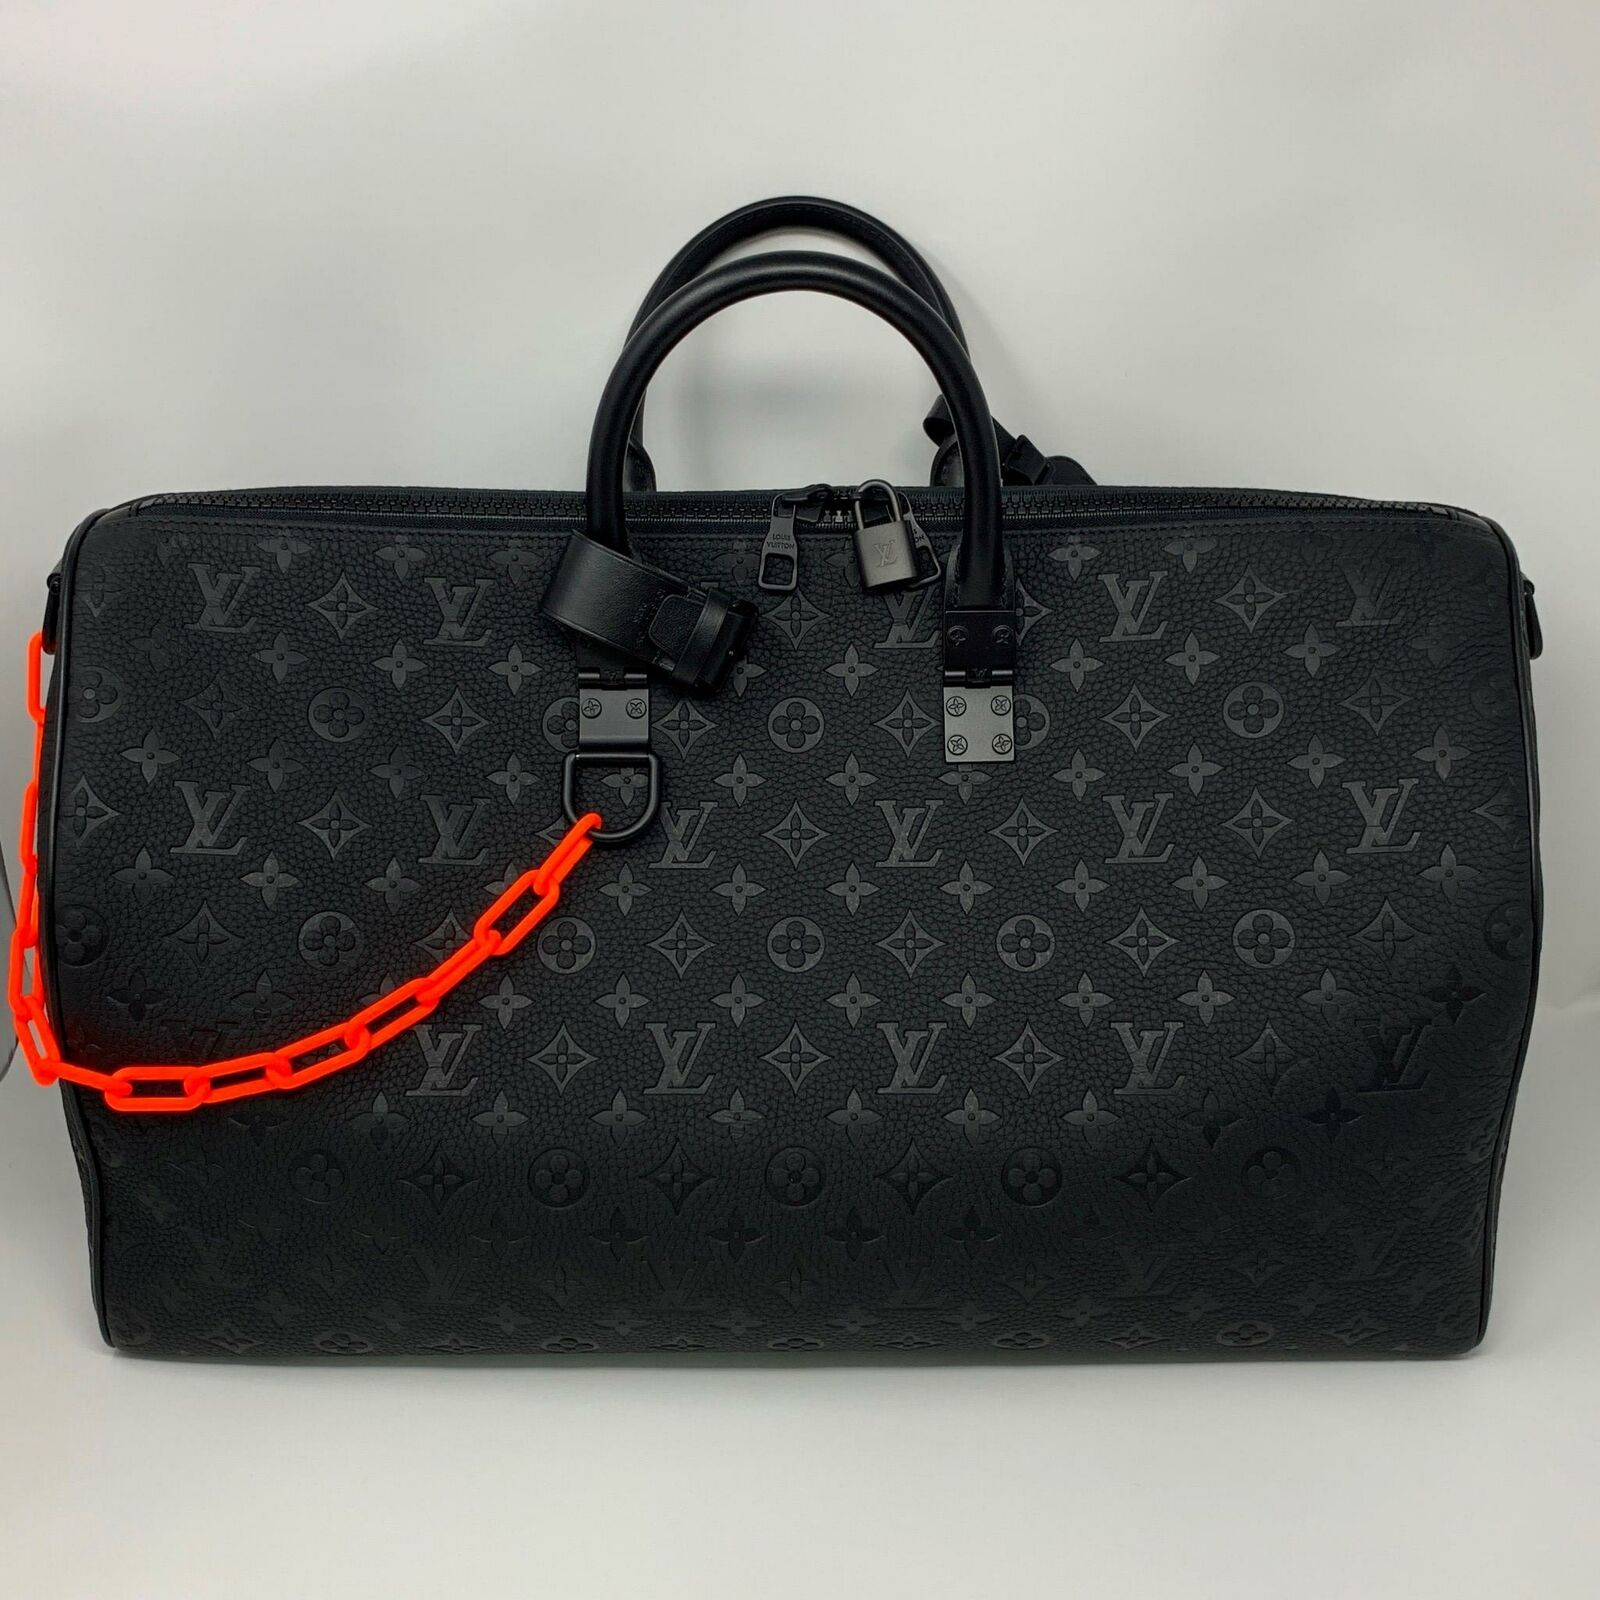 607b139830 Louis Vuitton x Virgil Abloh Keepall BLACK Taurillion embossed ...